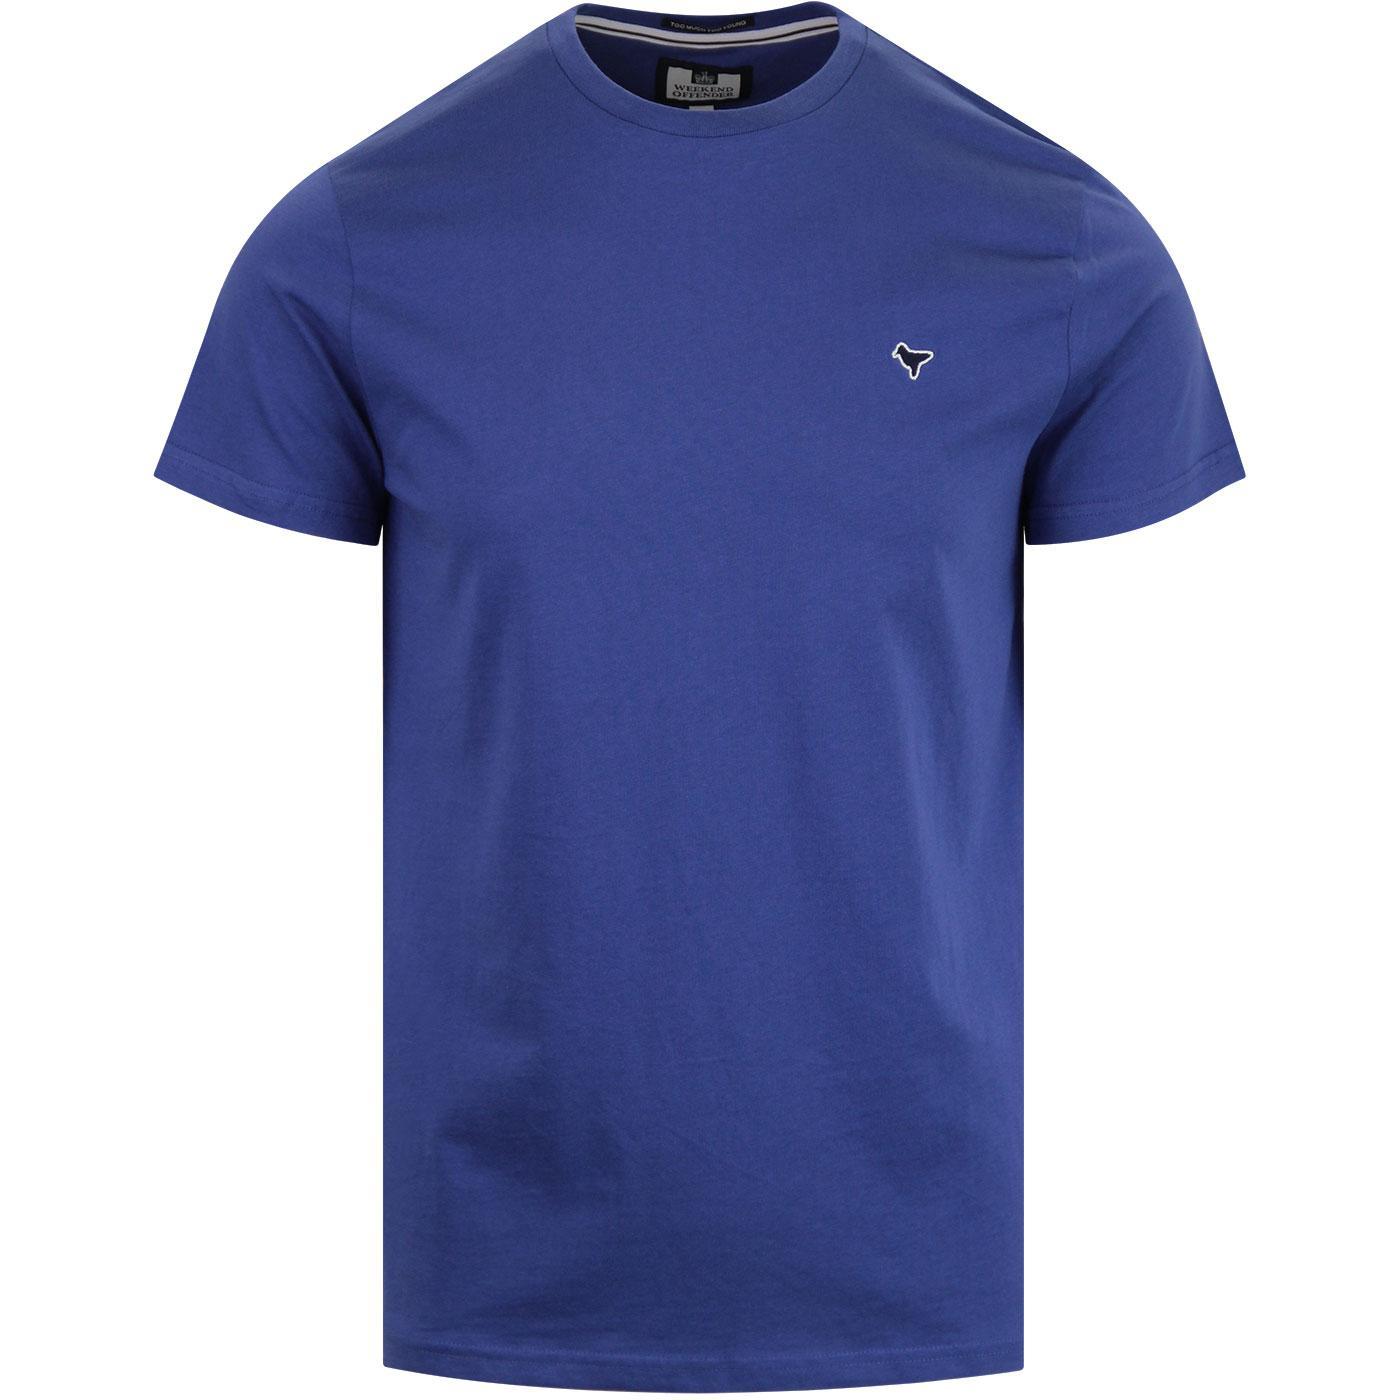 Enzo WEEKEND OFFENDER Retro T-Shirt Reef Blue